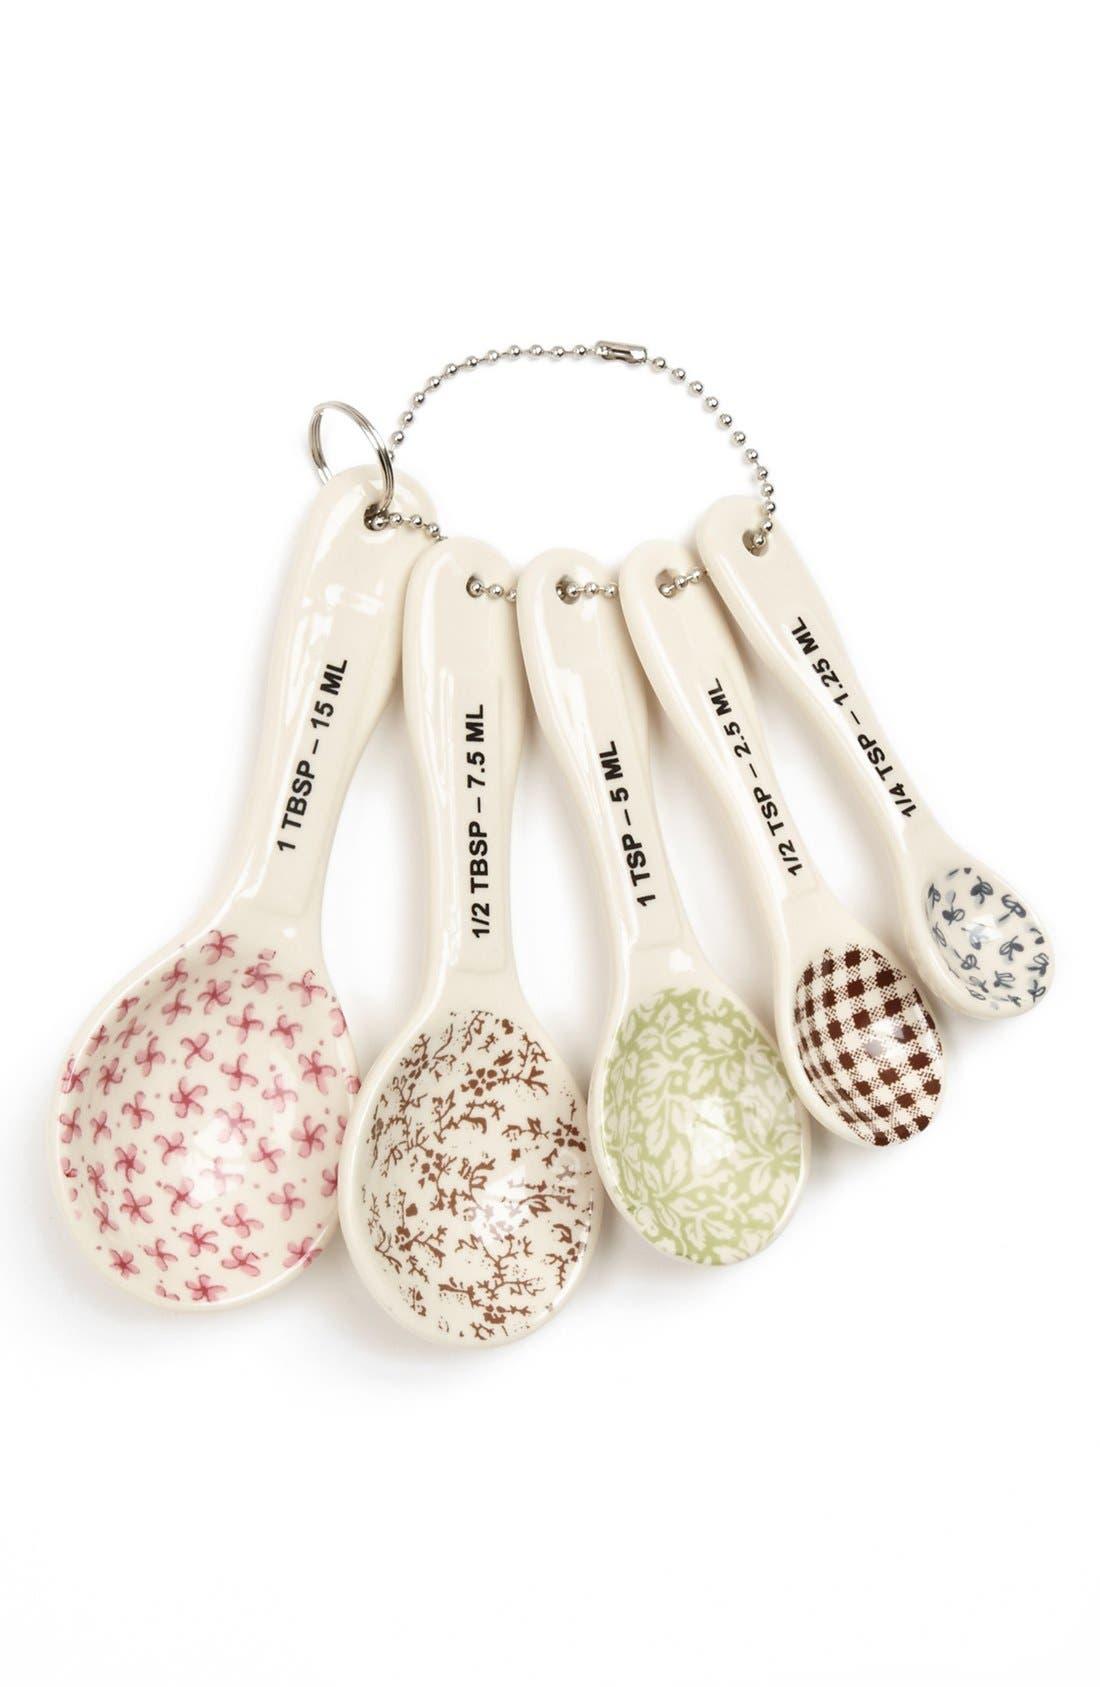 Main Image - Magenta Measuring Spoons (Set of 5)